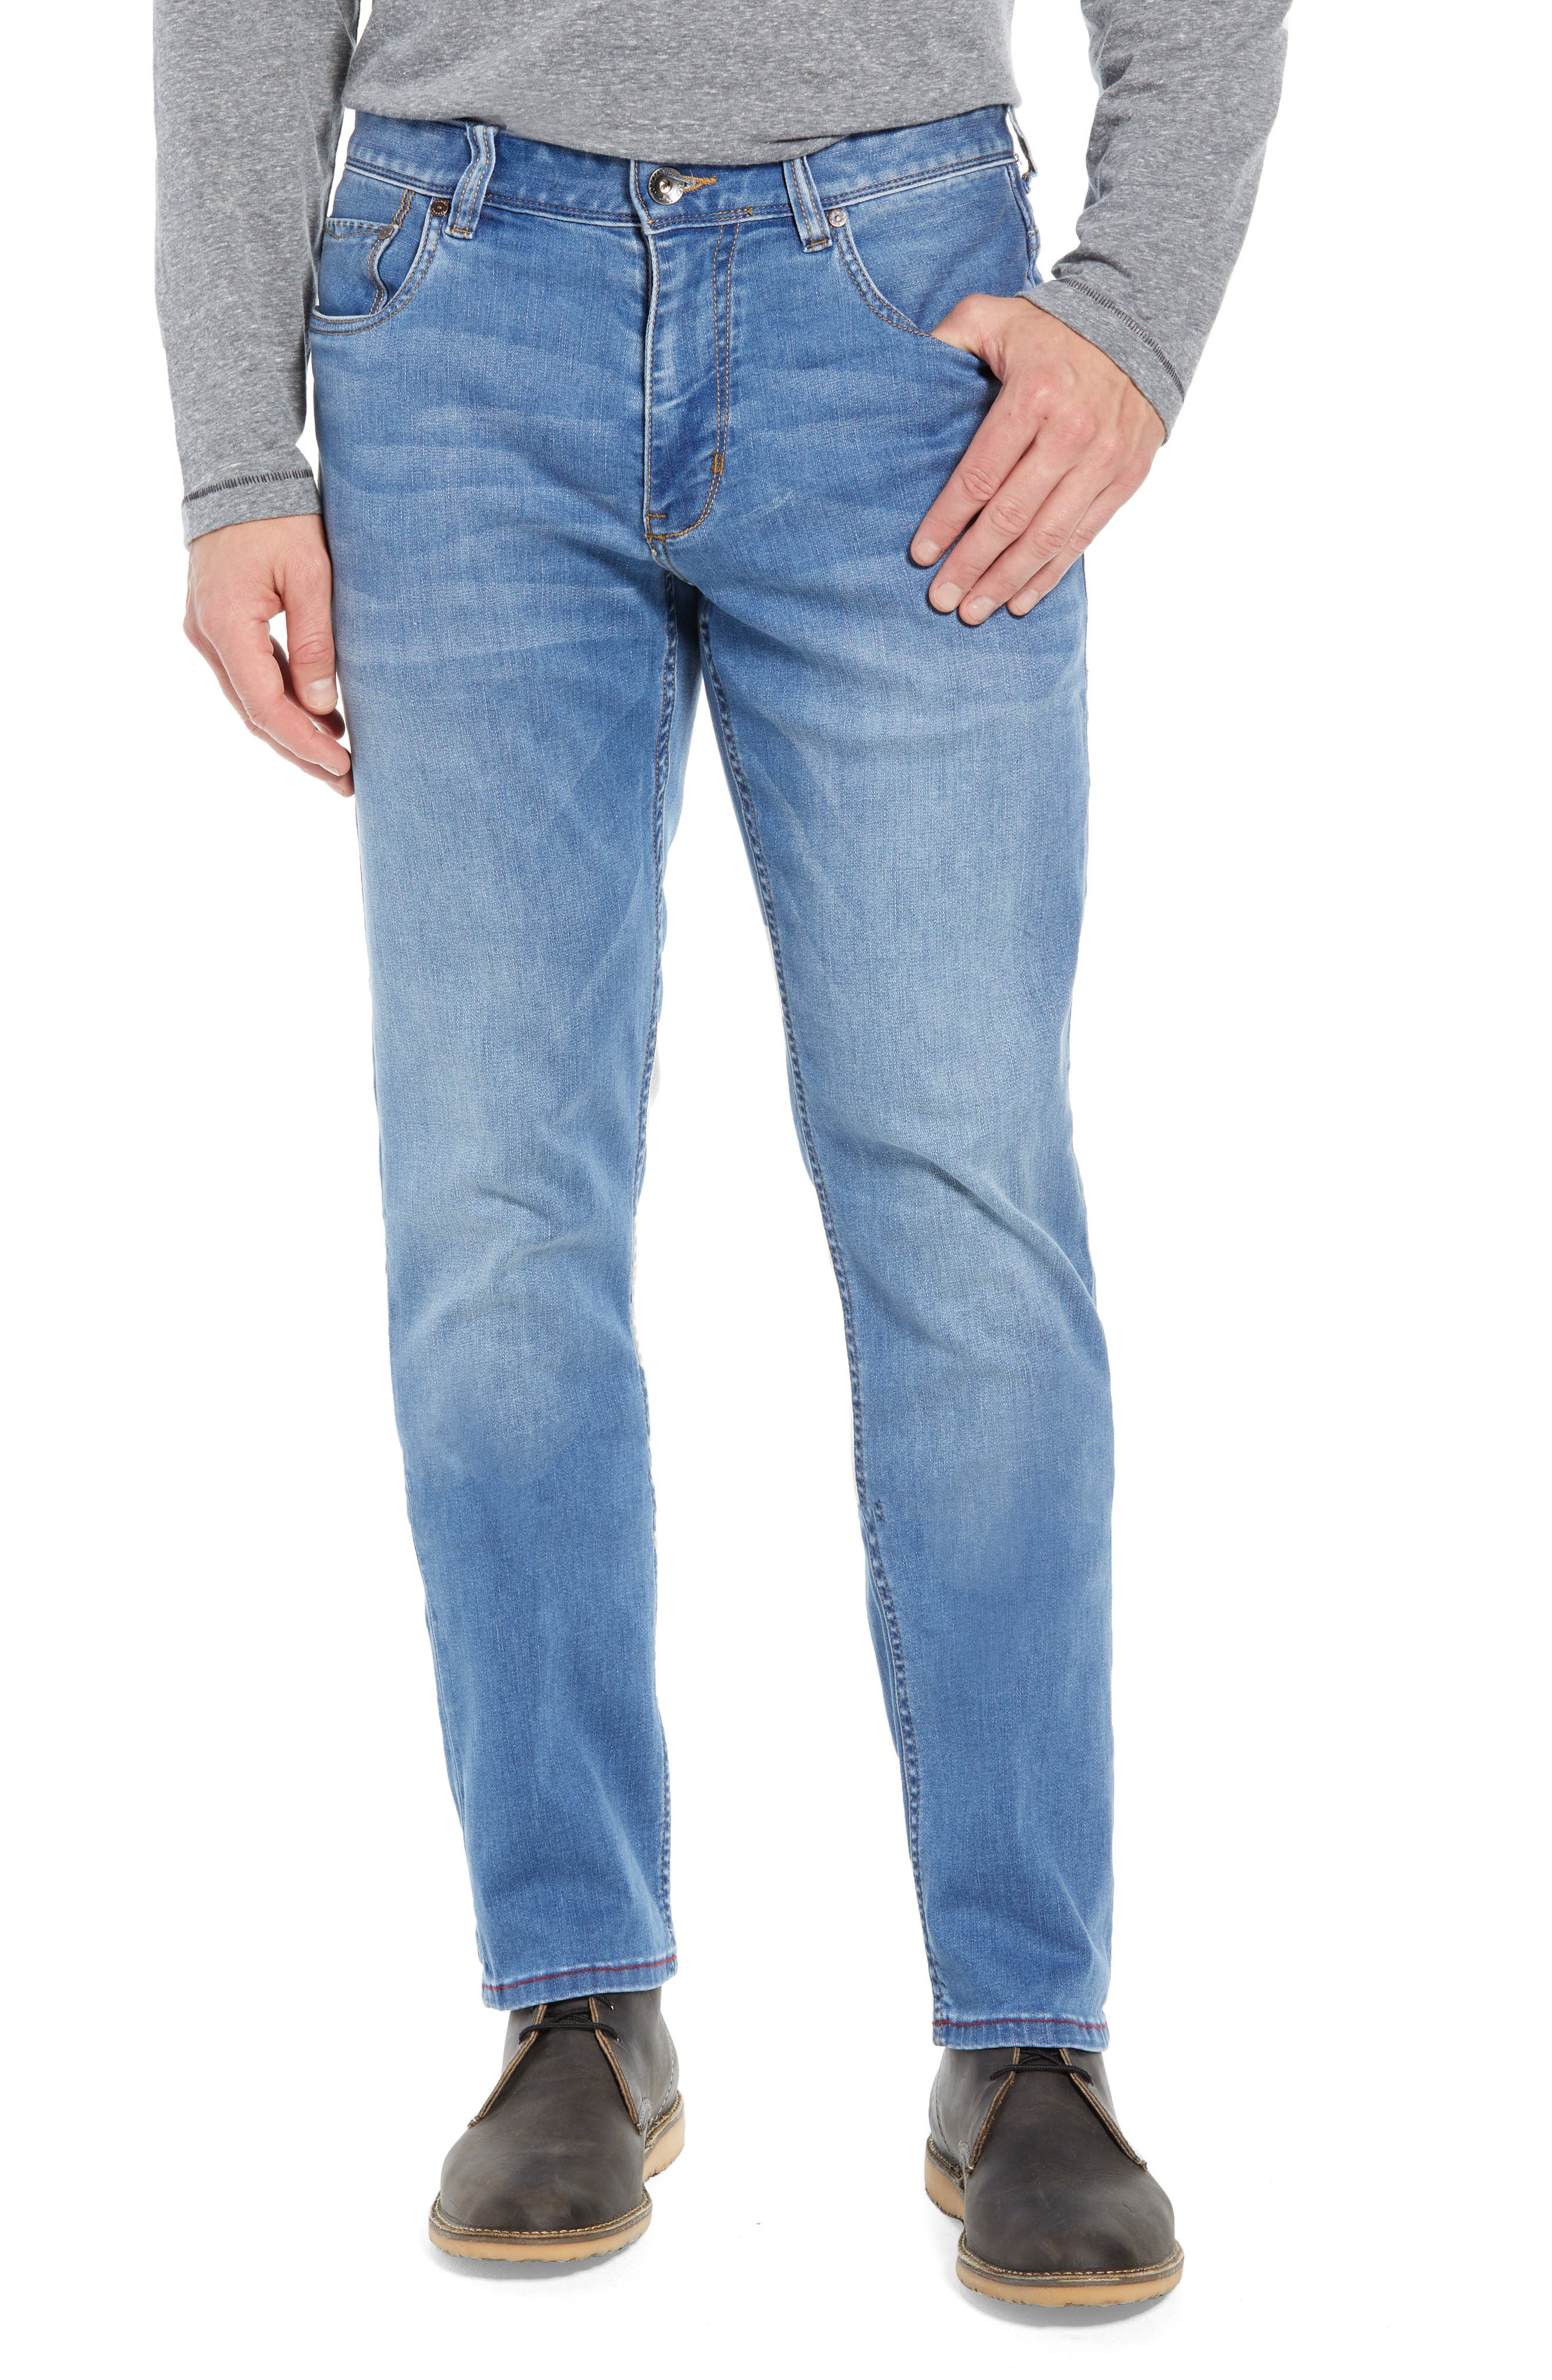 Costa Rica Vintage Regular Fit Jeans,                             Main thumbnail 1, color,                             MED WASH